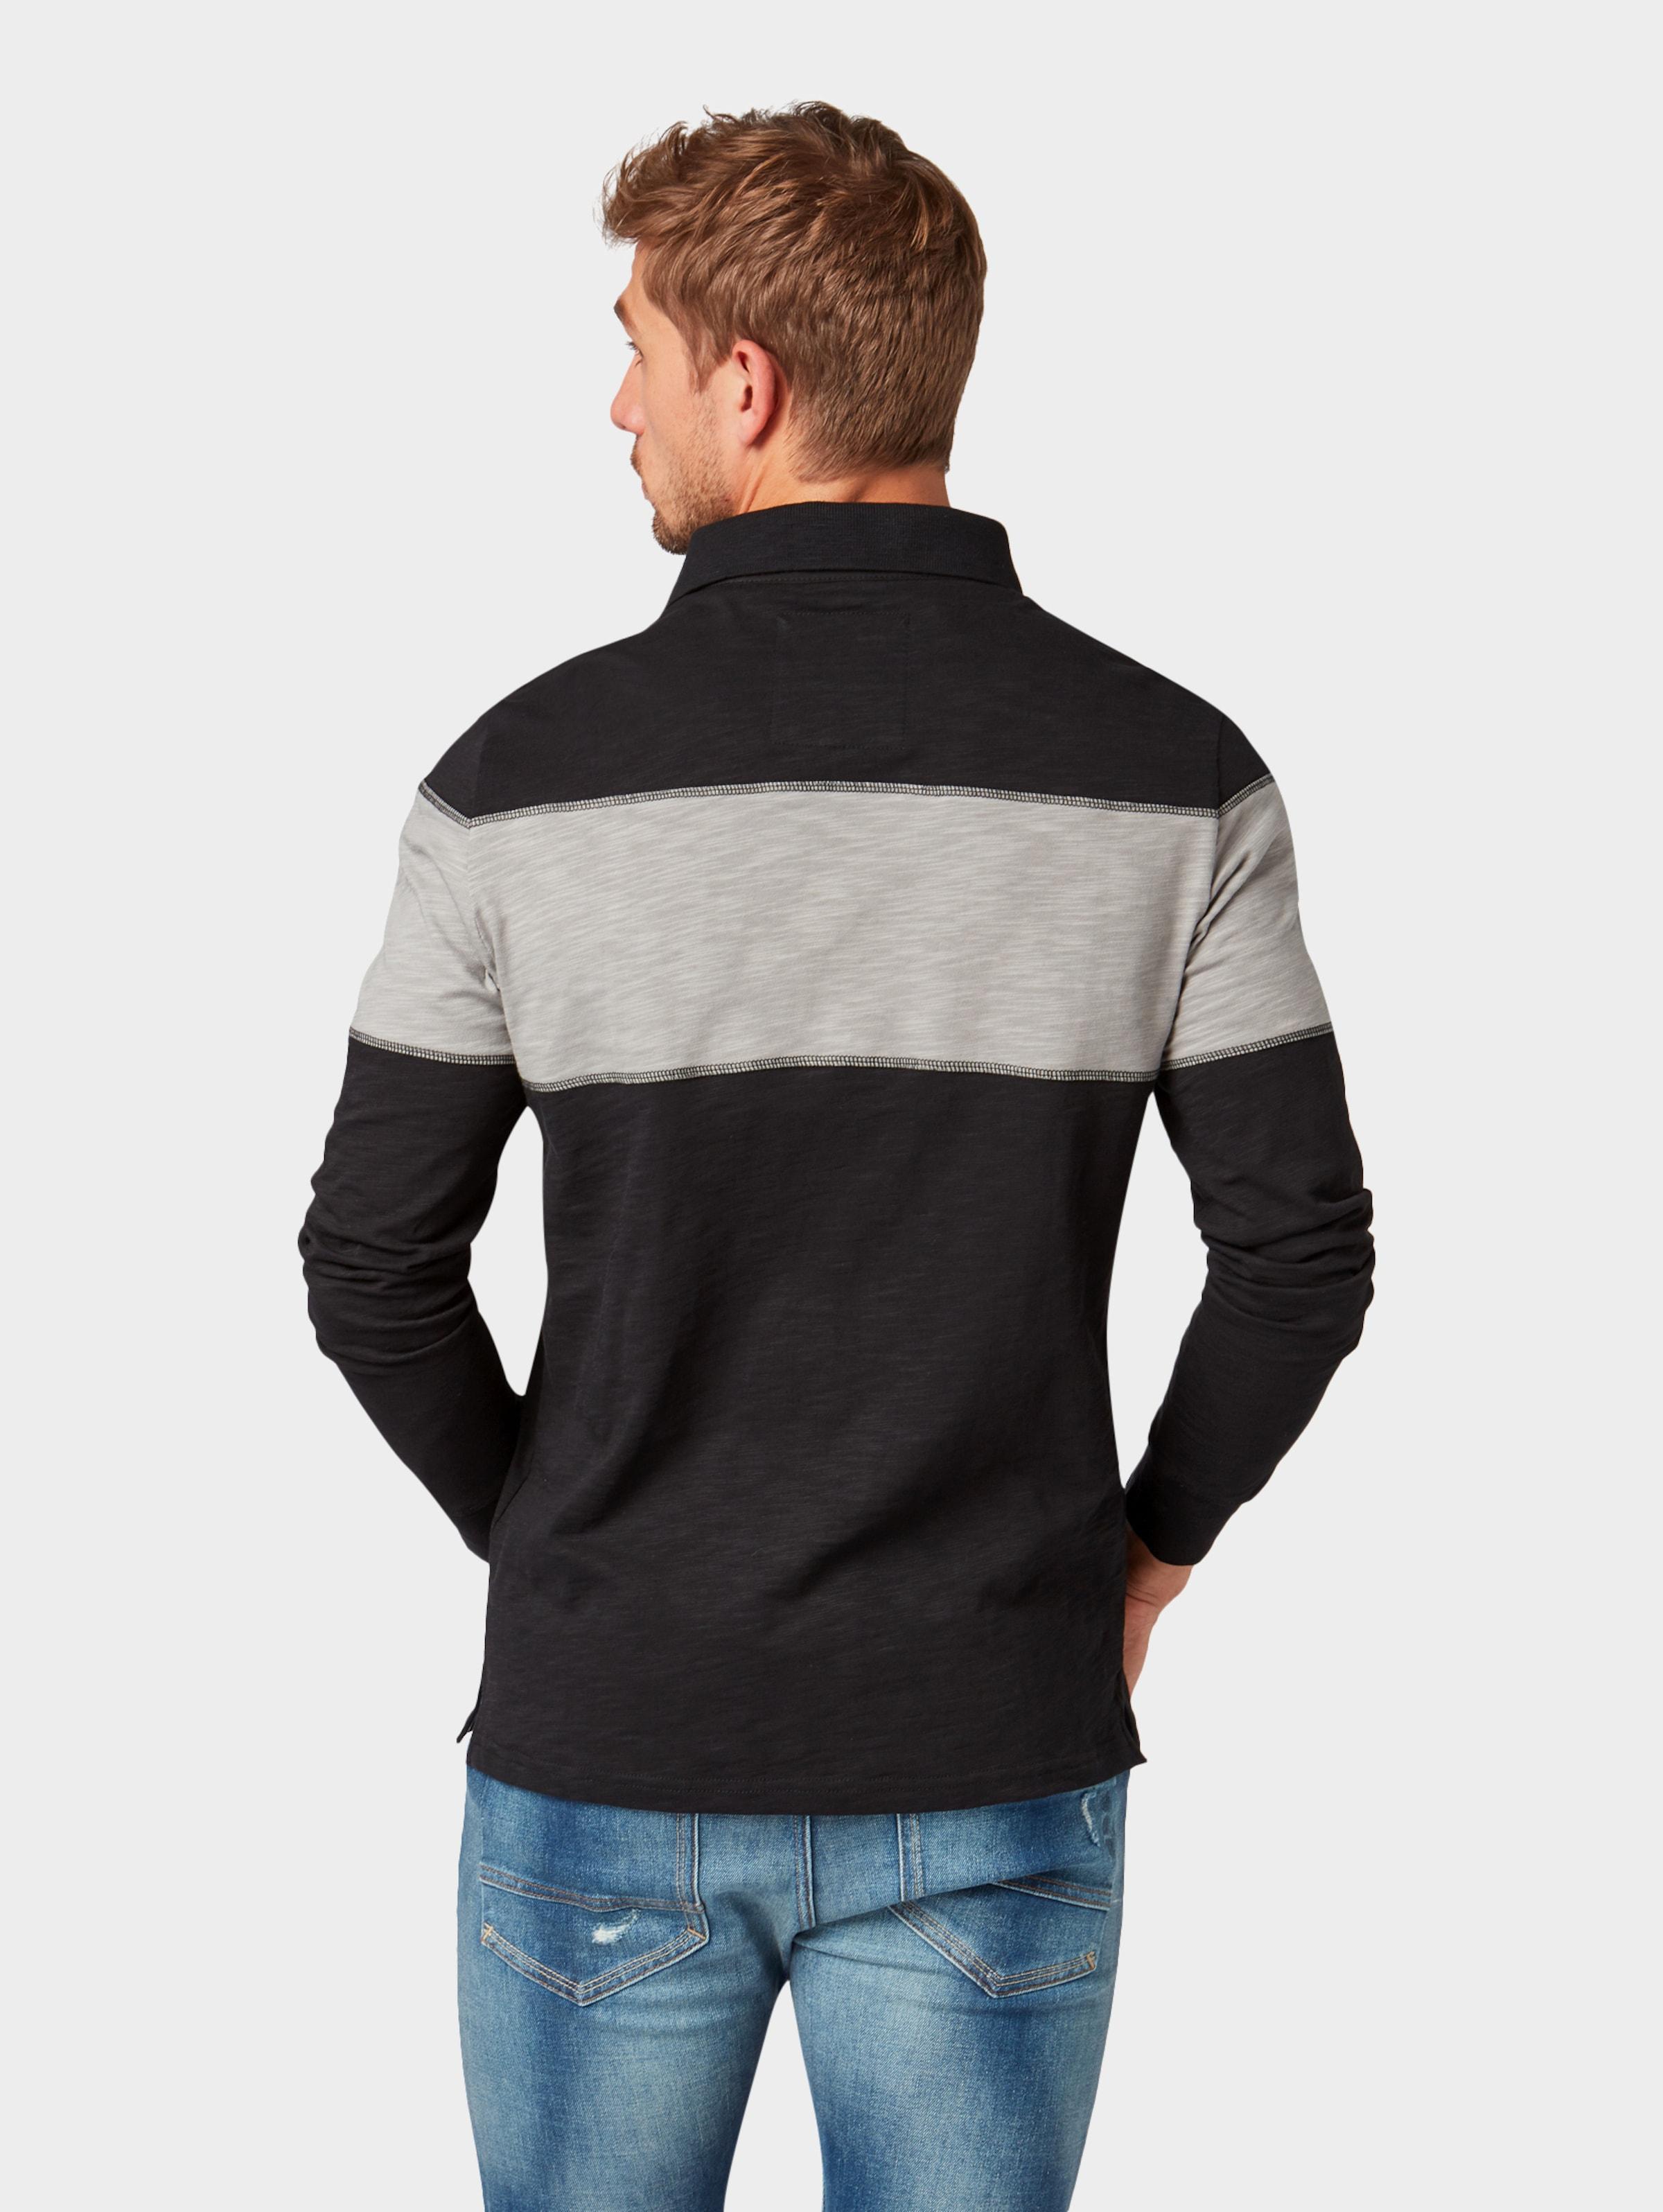 BeigemeliertSchwarzmeliert Tom Tailor Shirt Shirt In In BeigemeliertSchwarzmeliert Tailor Tailor Shirt Tom In Tom deEBCoWxQr